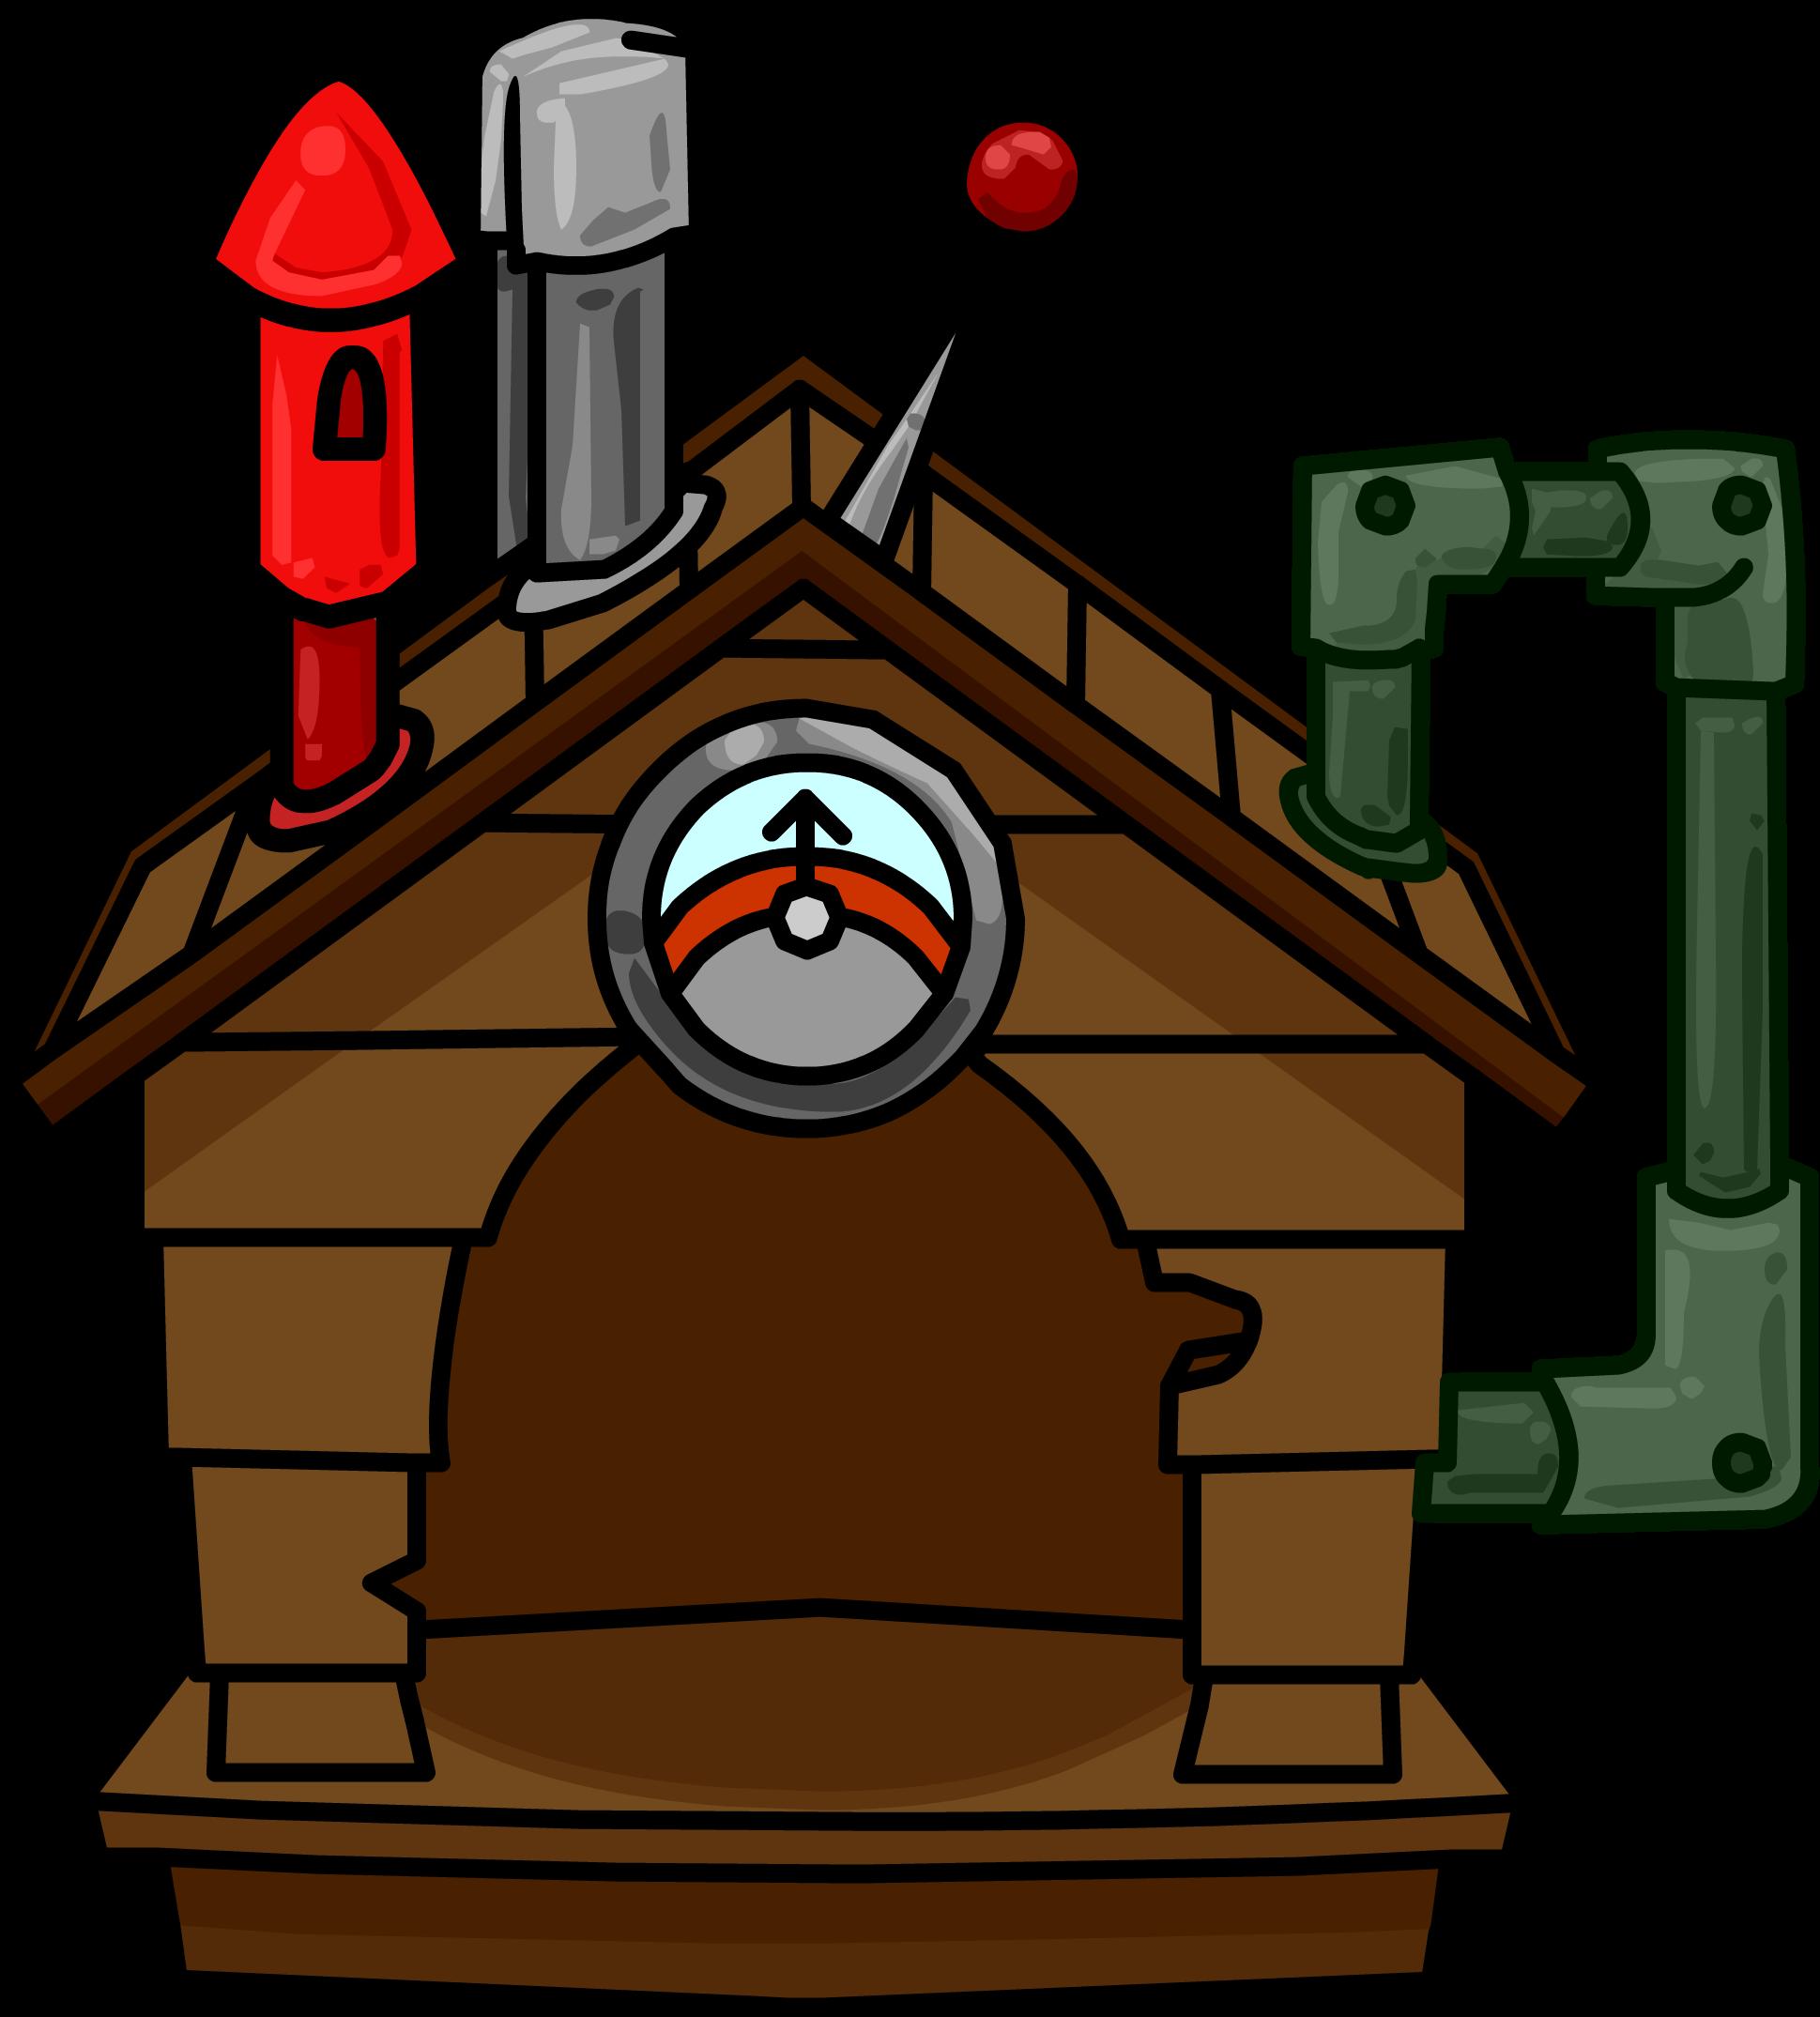 Brown Puffle House (ID 665)